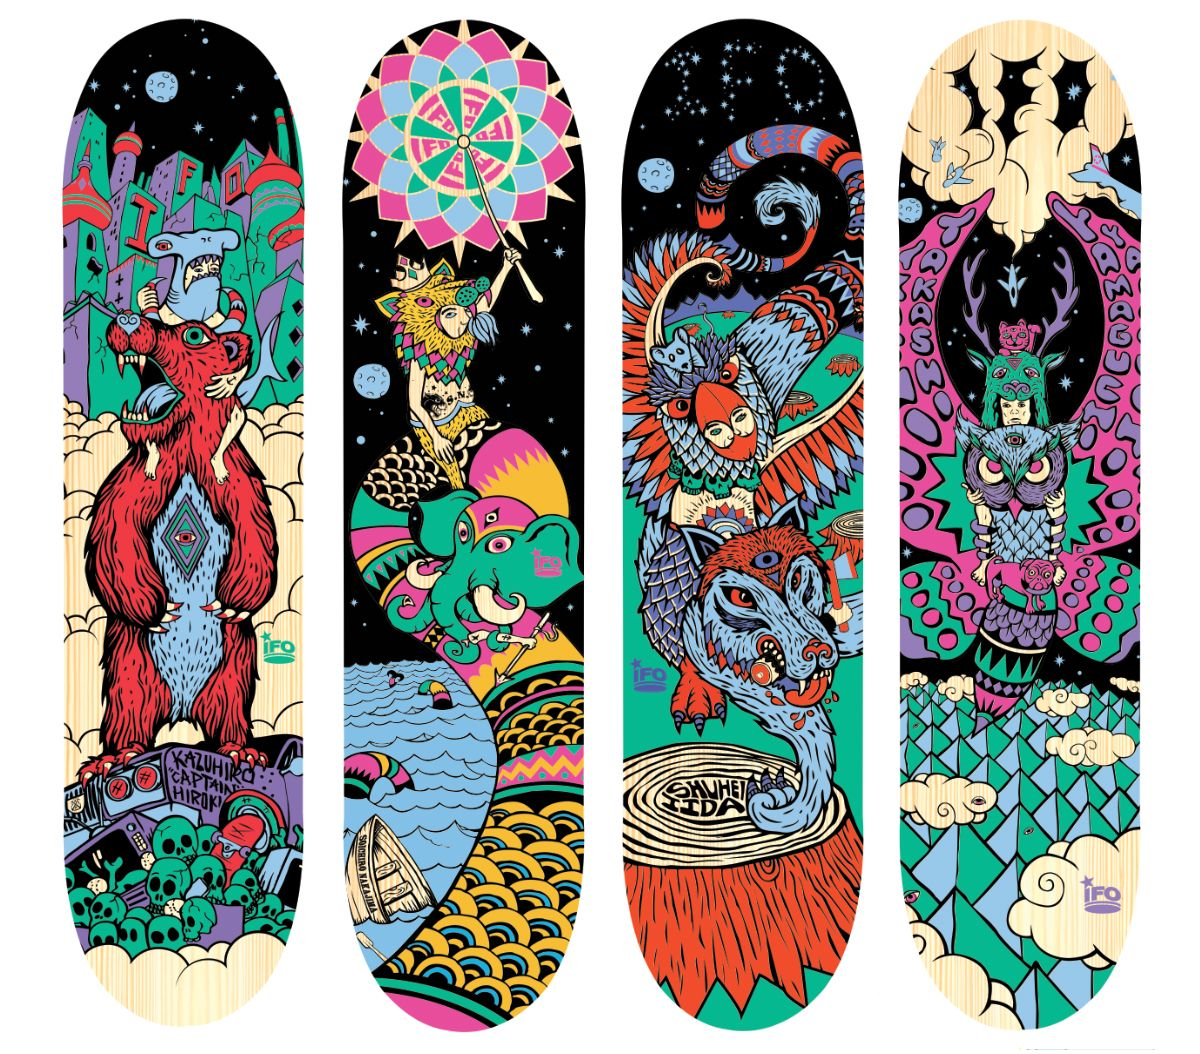 Pin By Jordan Arp On Skateboard Designs Skateboard Art Design Skateboard Art Skateboard Design